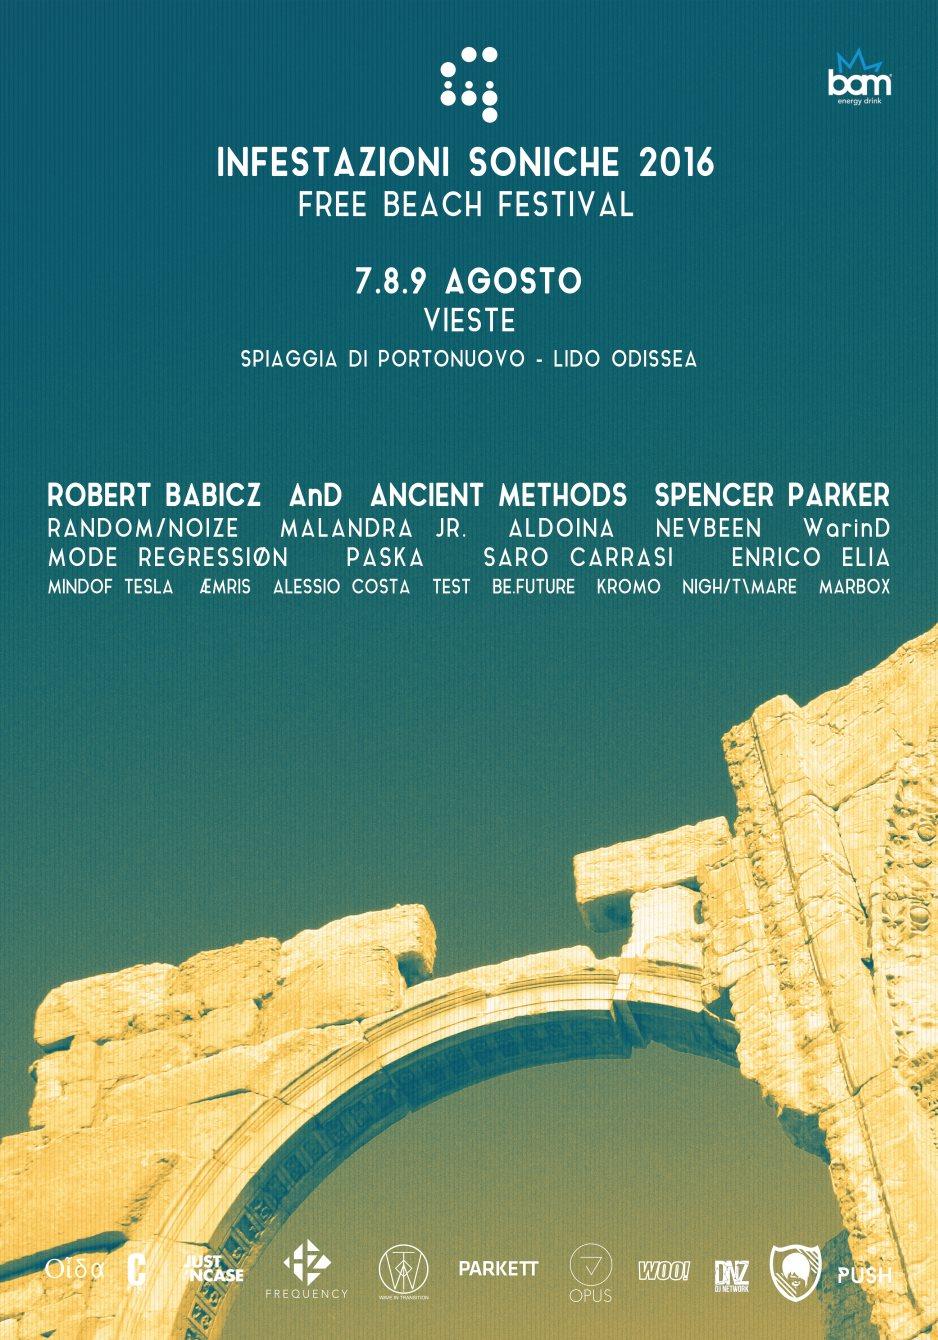 ISF Infestazioni Soniche 2016 - Free Beach Festival - Flyer front